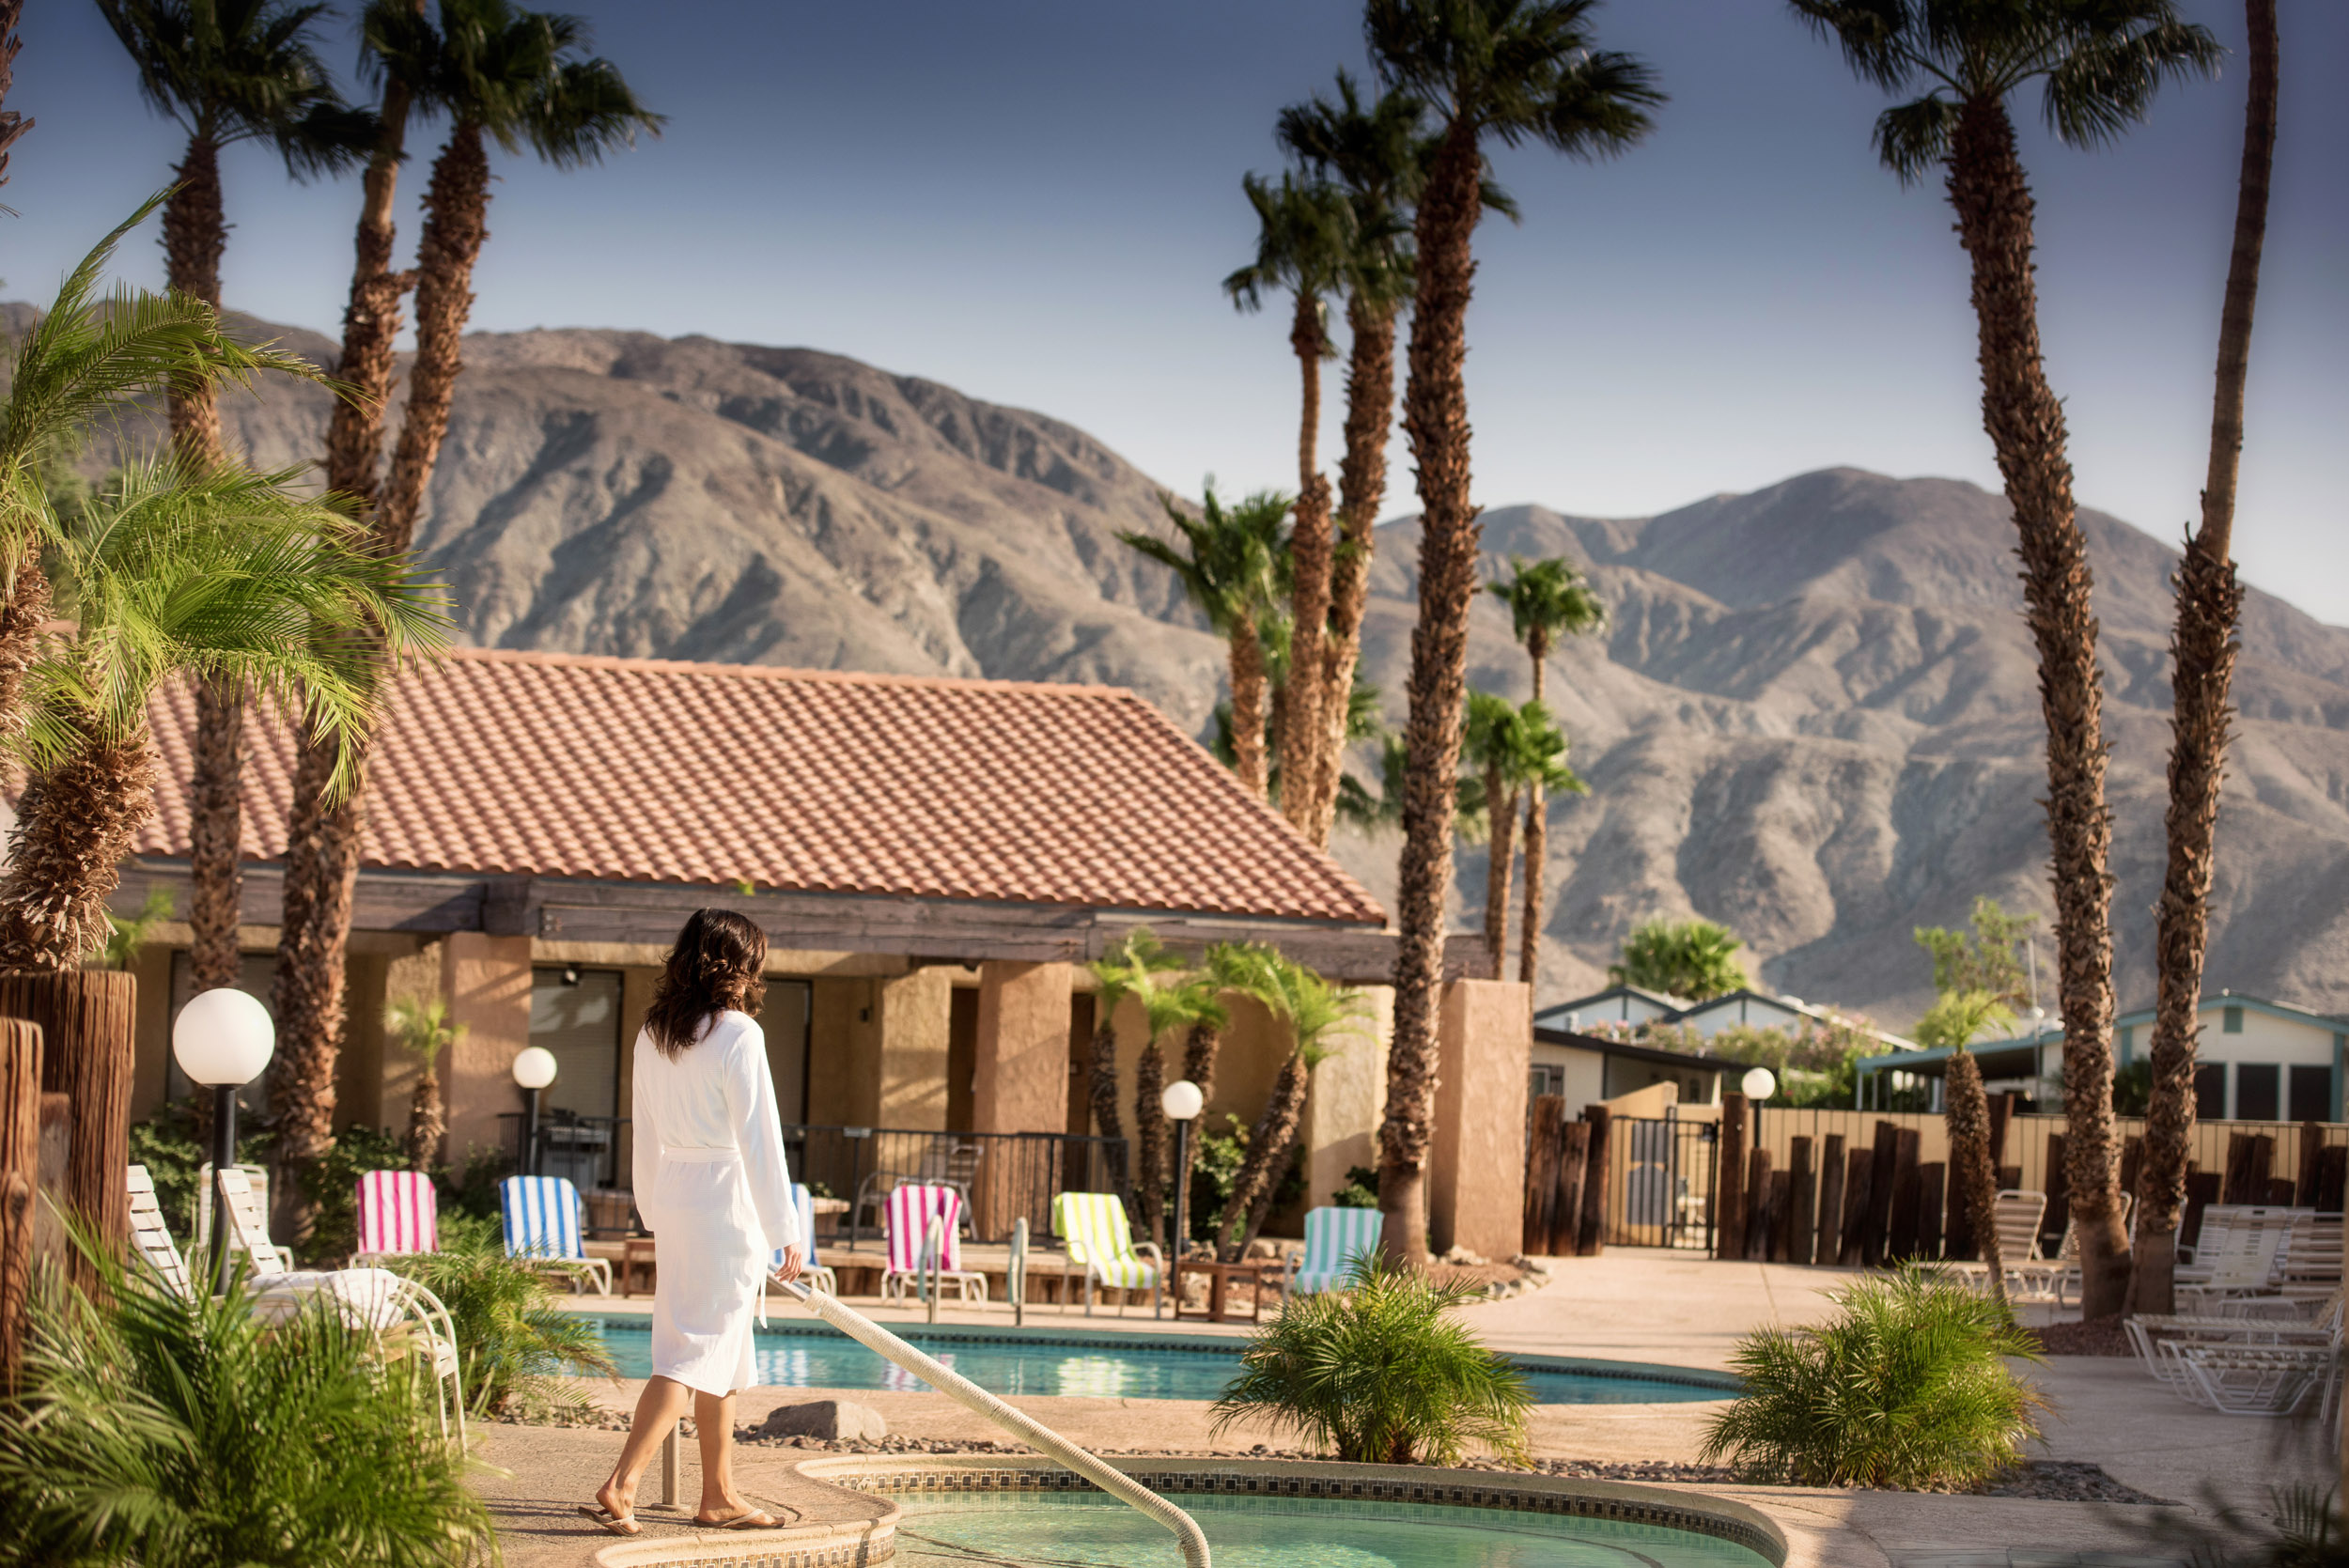 hot-springs-palm-springs-california.jpg